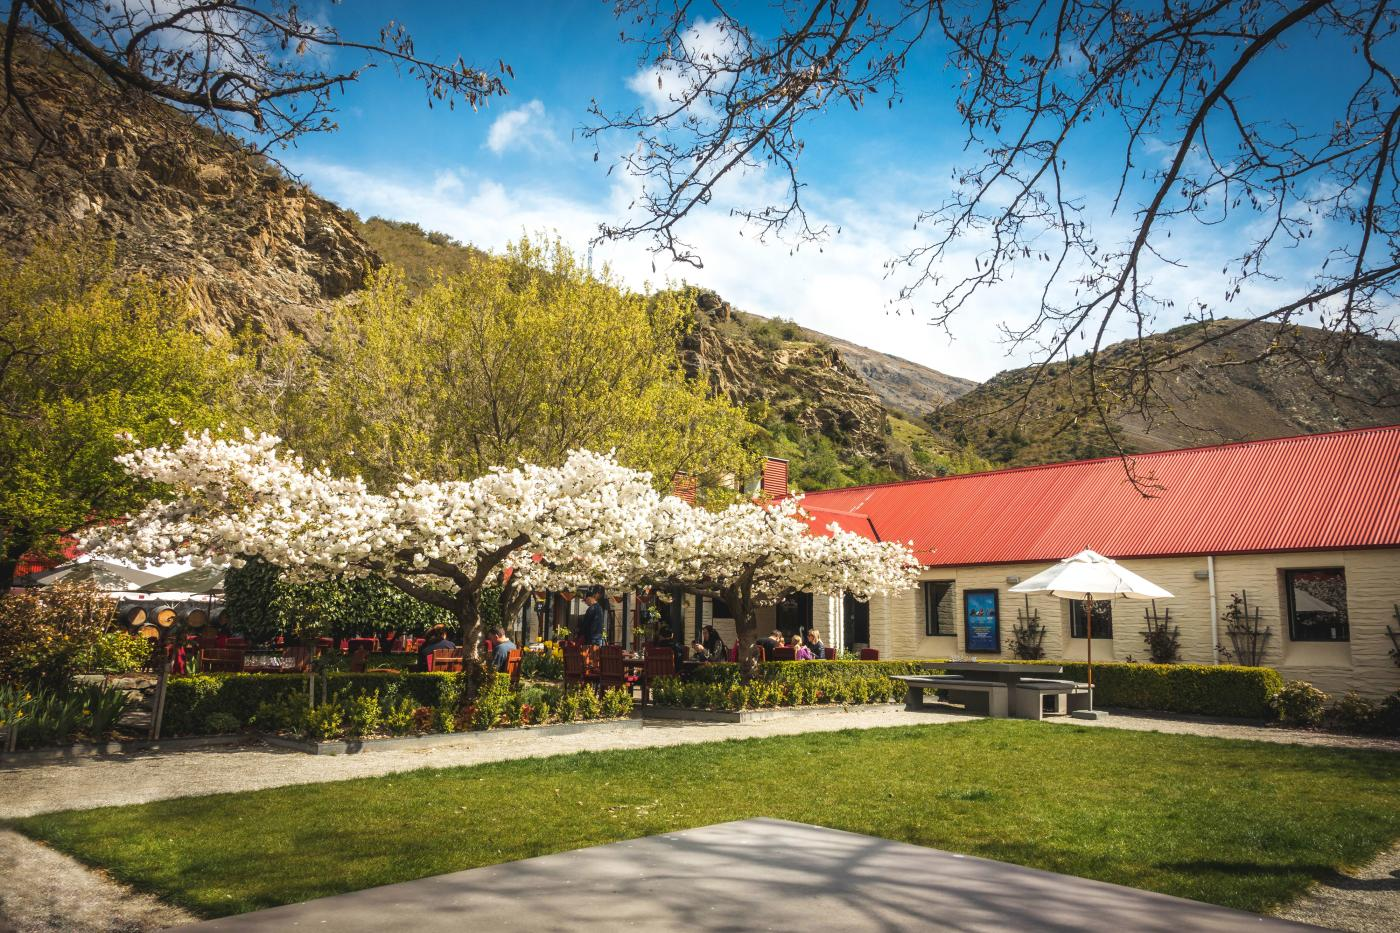 Gibbston Valley Winery Cellar Door Garden in Spring